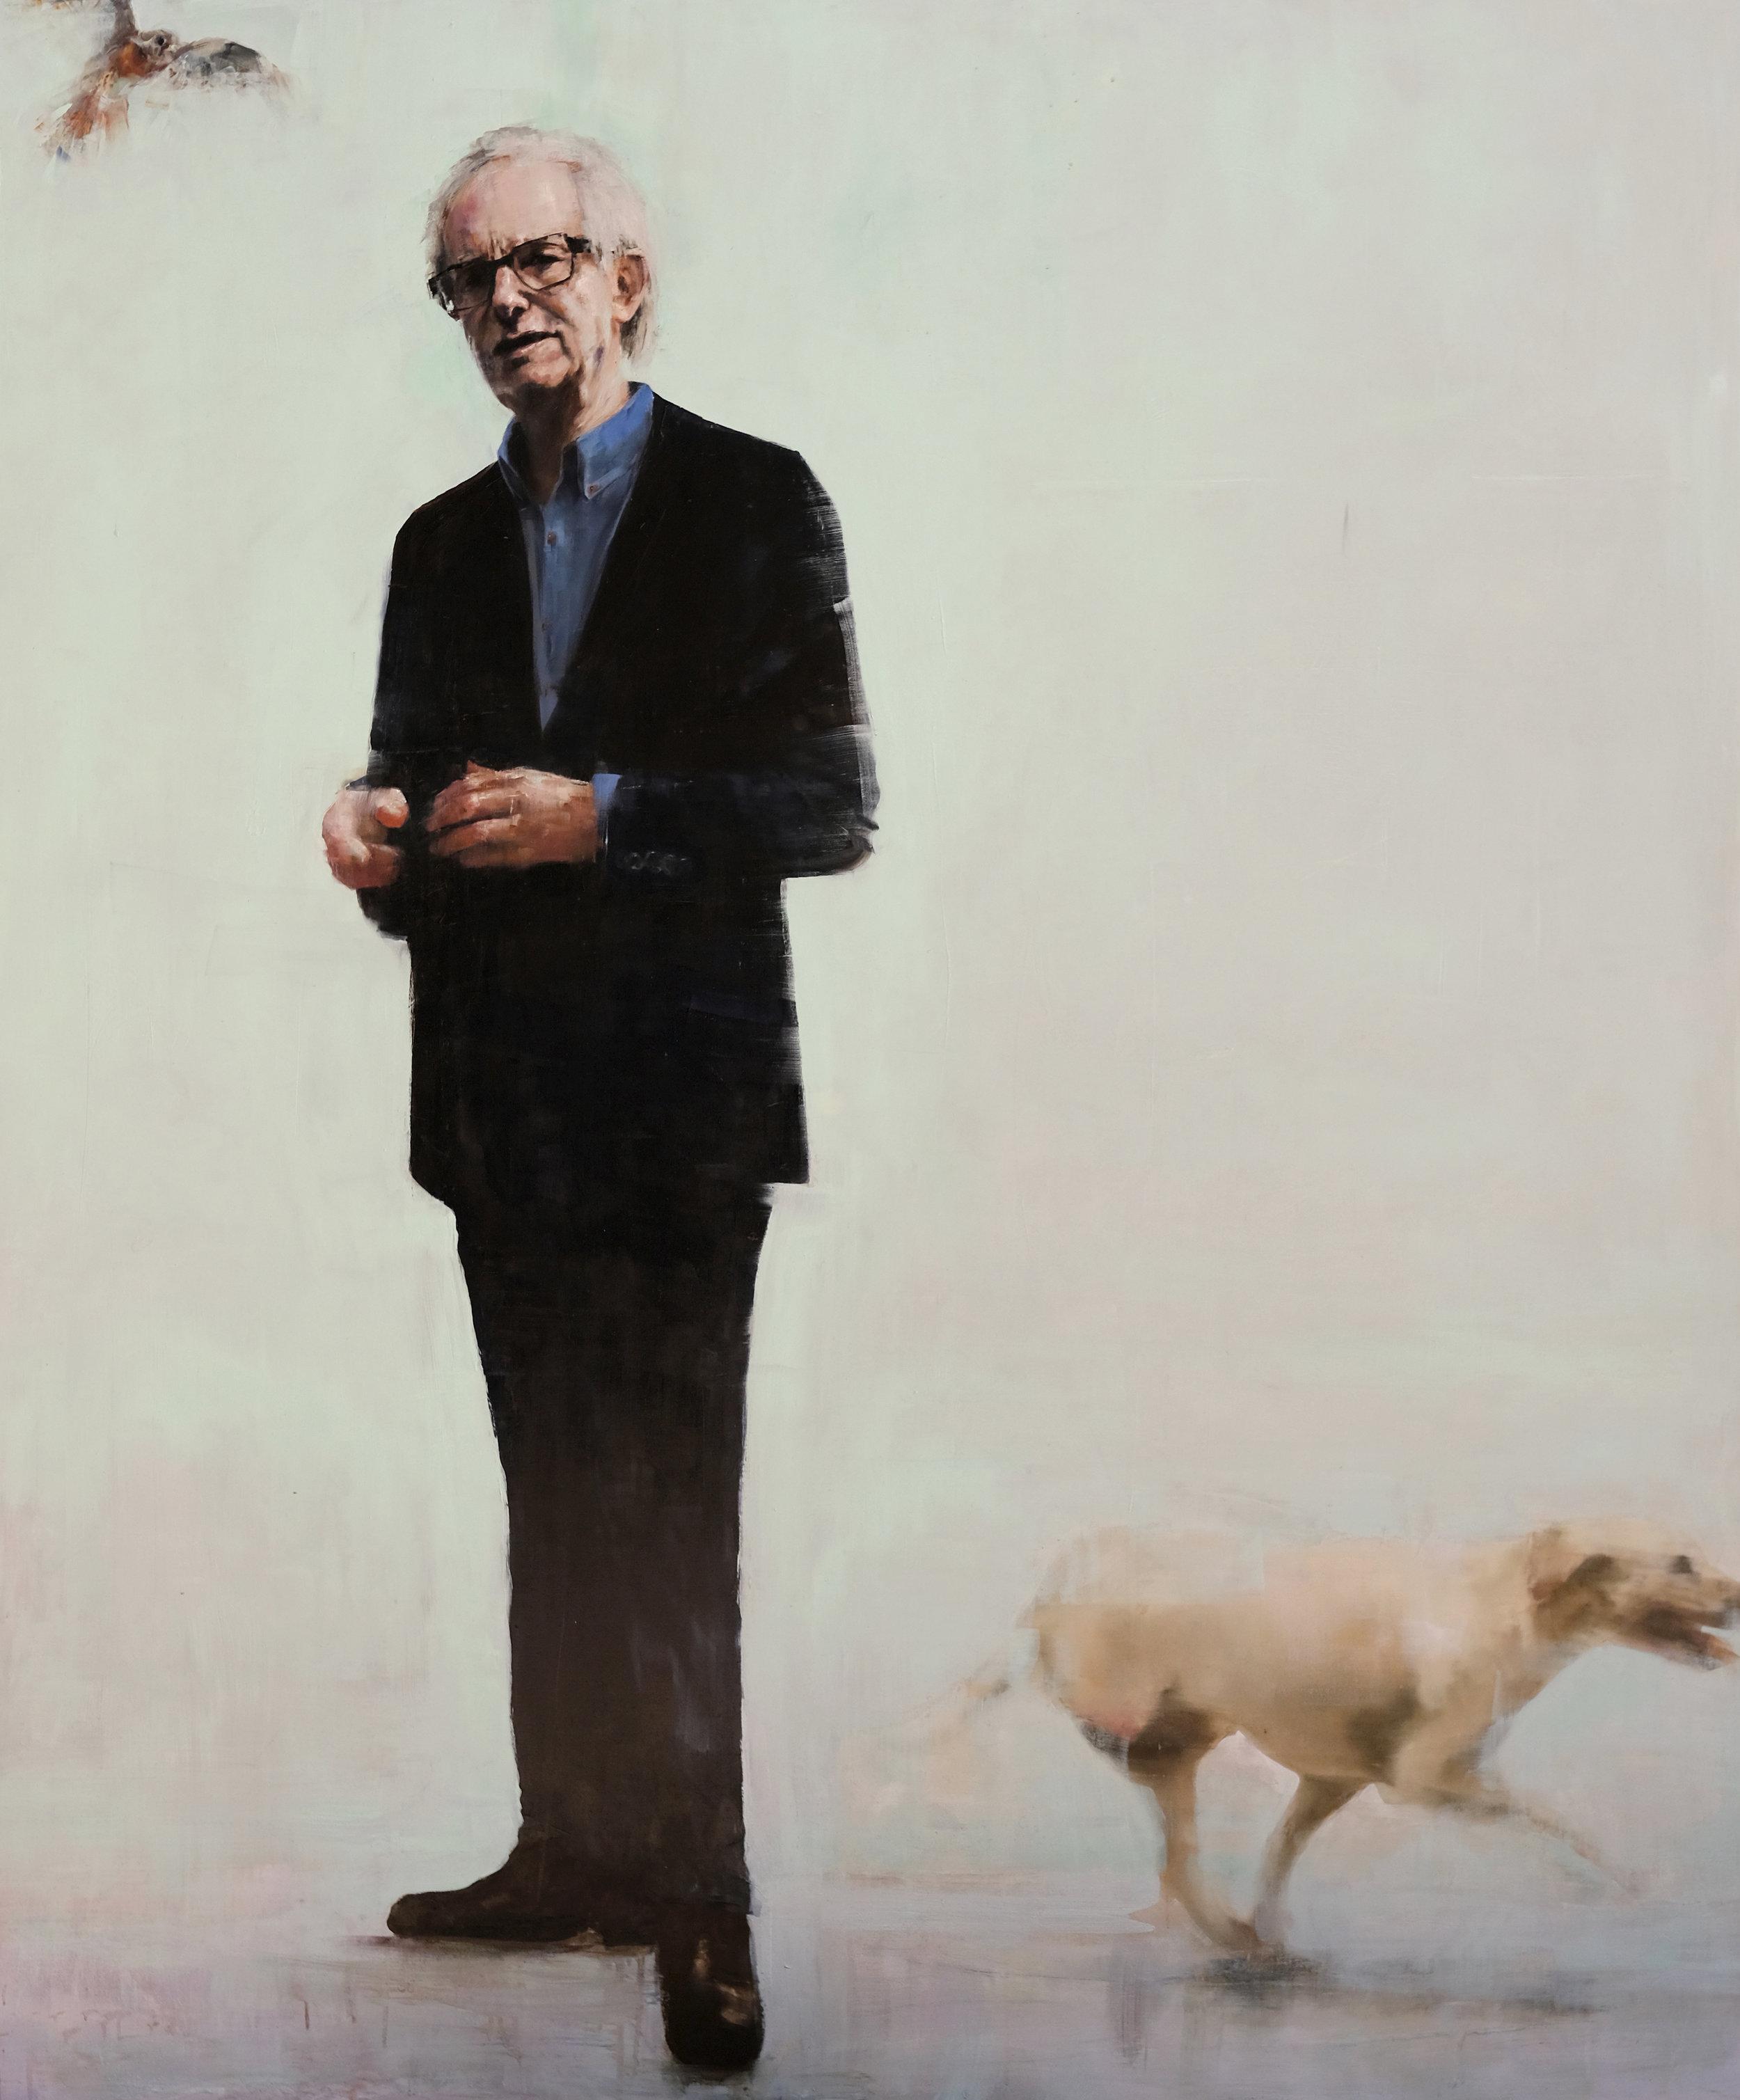 Commission a portrait by Richard Twose